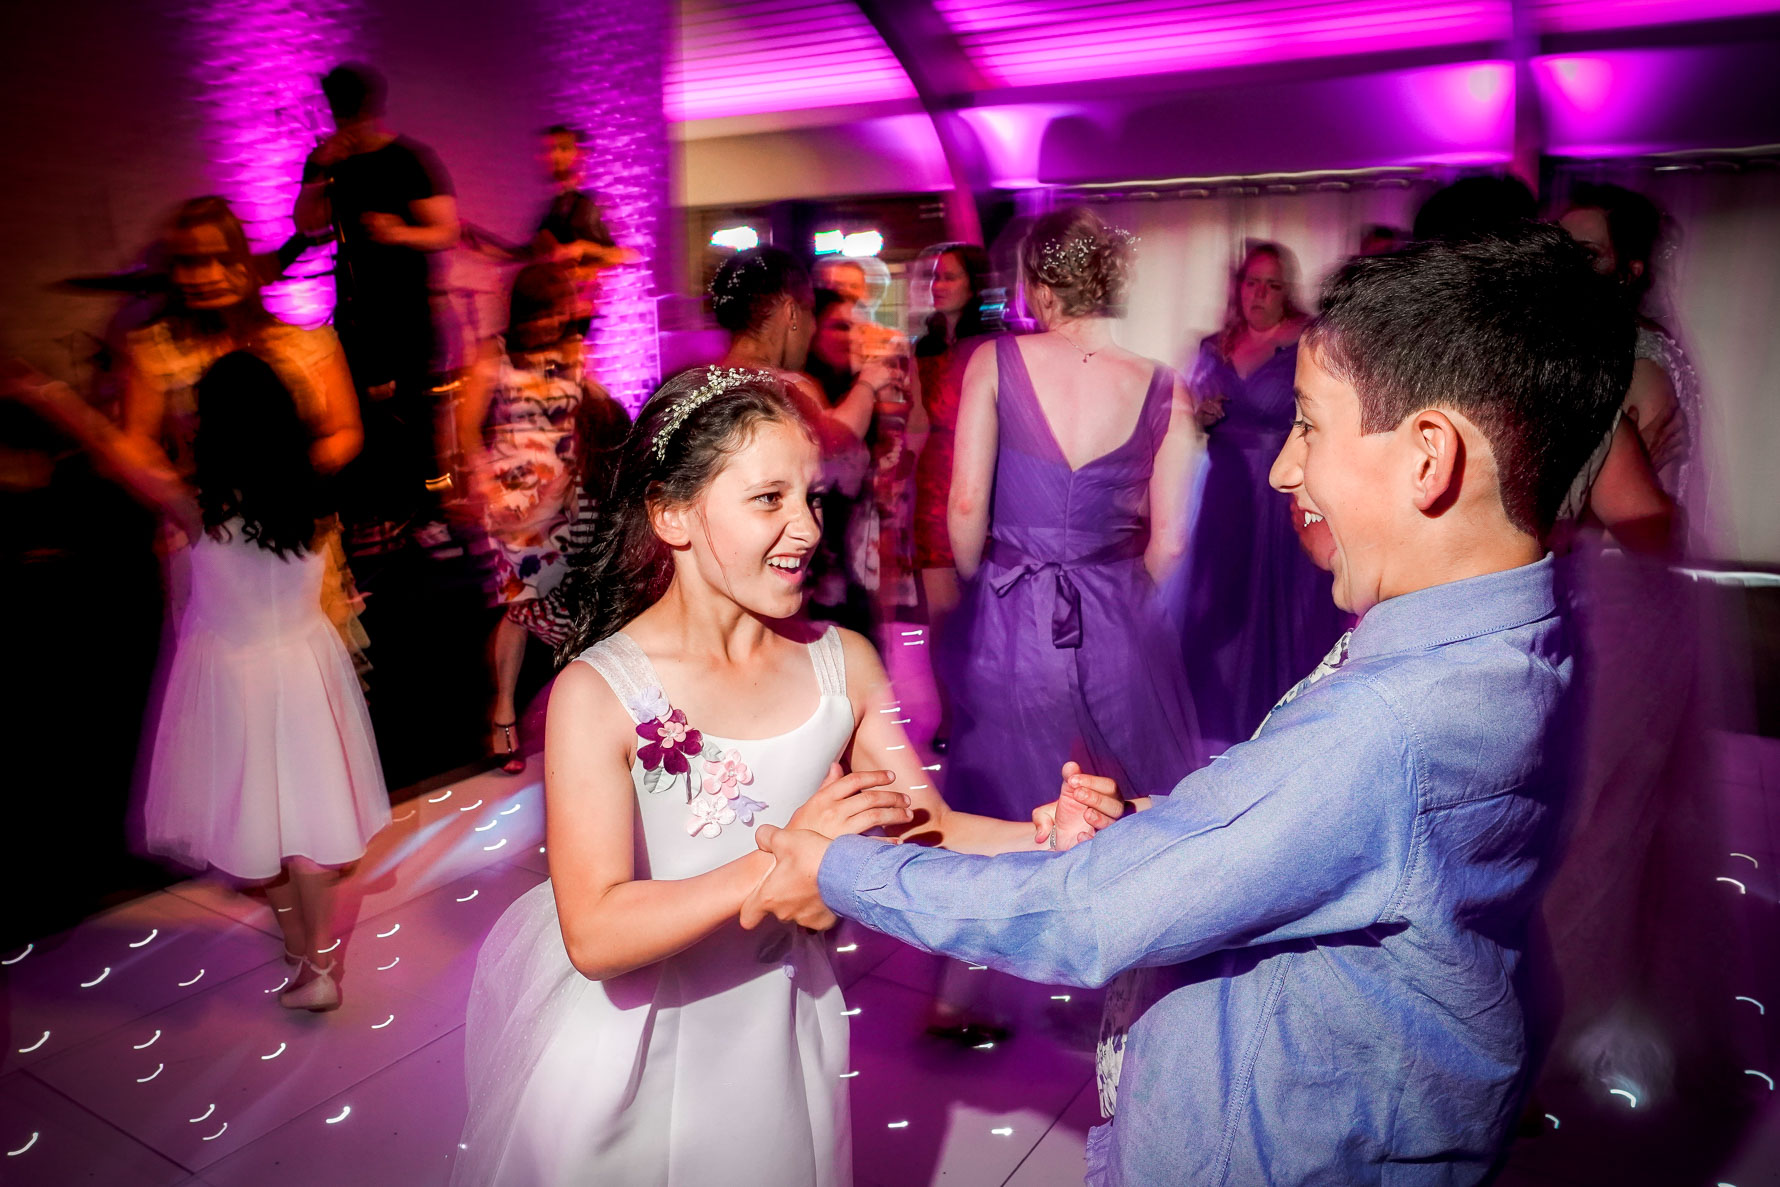 on the dance floor with dj